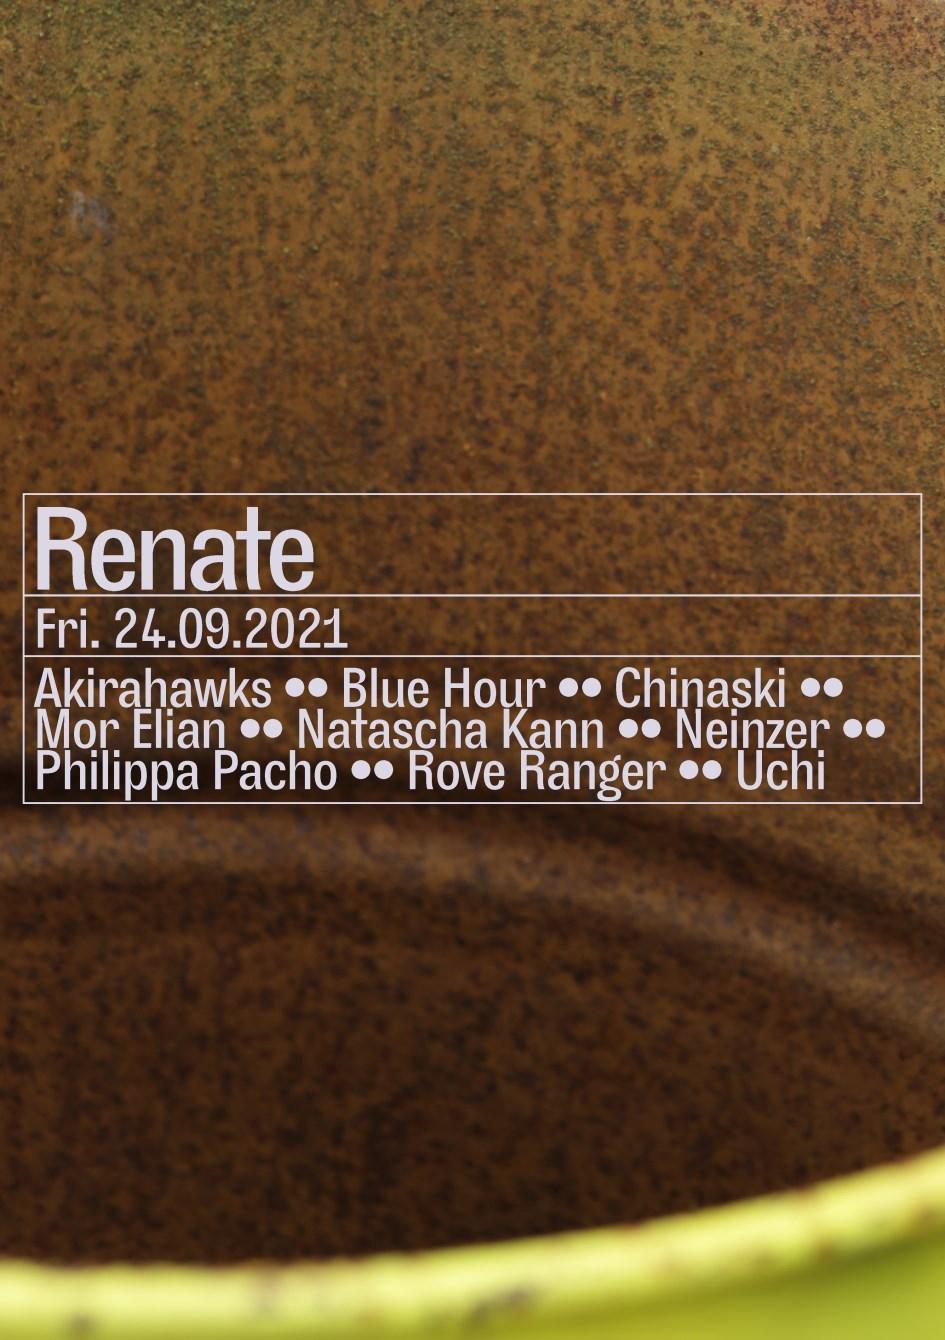 Mor Elian, Blue Hour, Rove Ranger, Chinaski - Flyer front